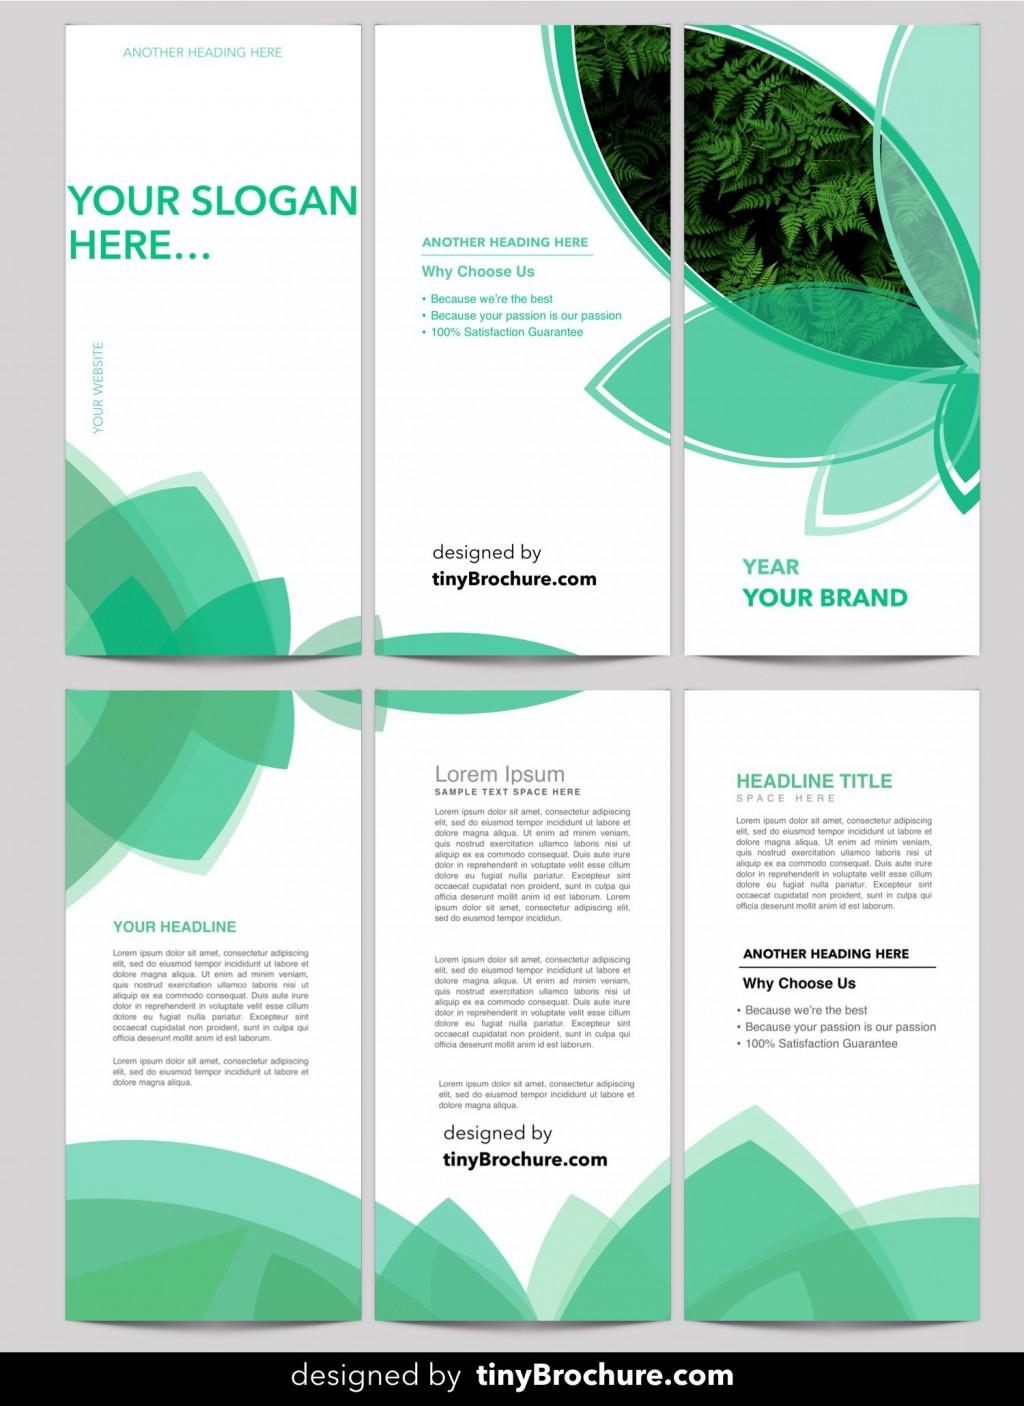 001 Unusual Microsoft Word Brochure Template Image  Templates 2010 Tri Fold A4 2007 Free DownloadLarge